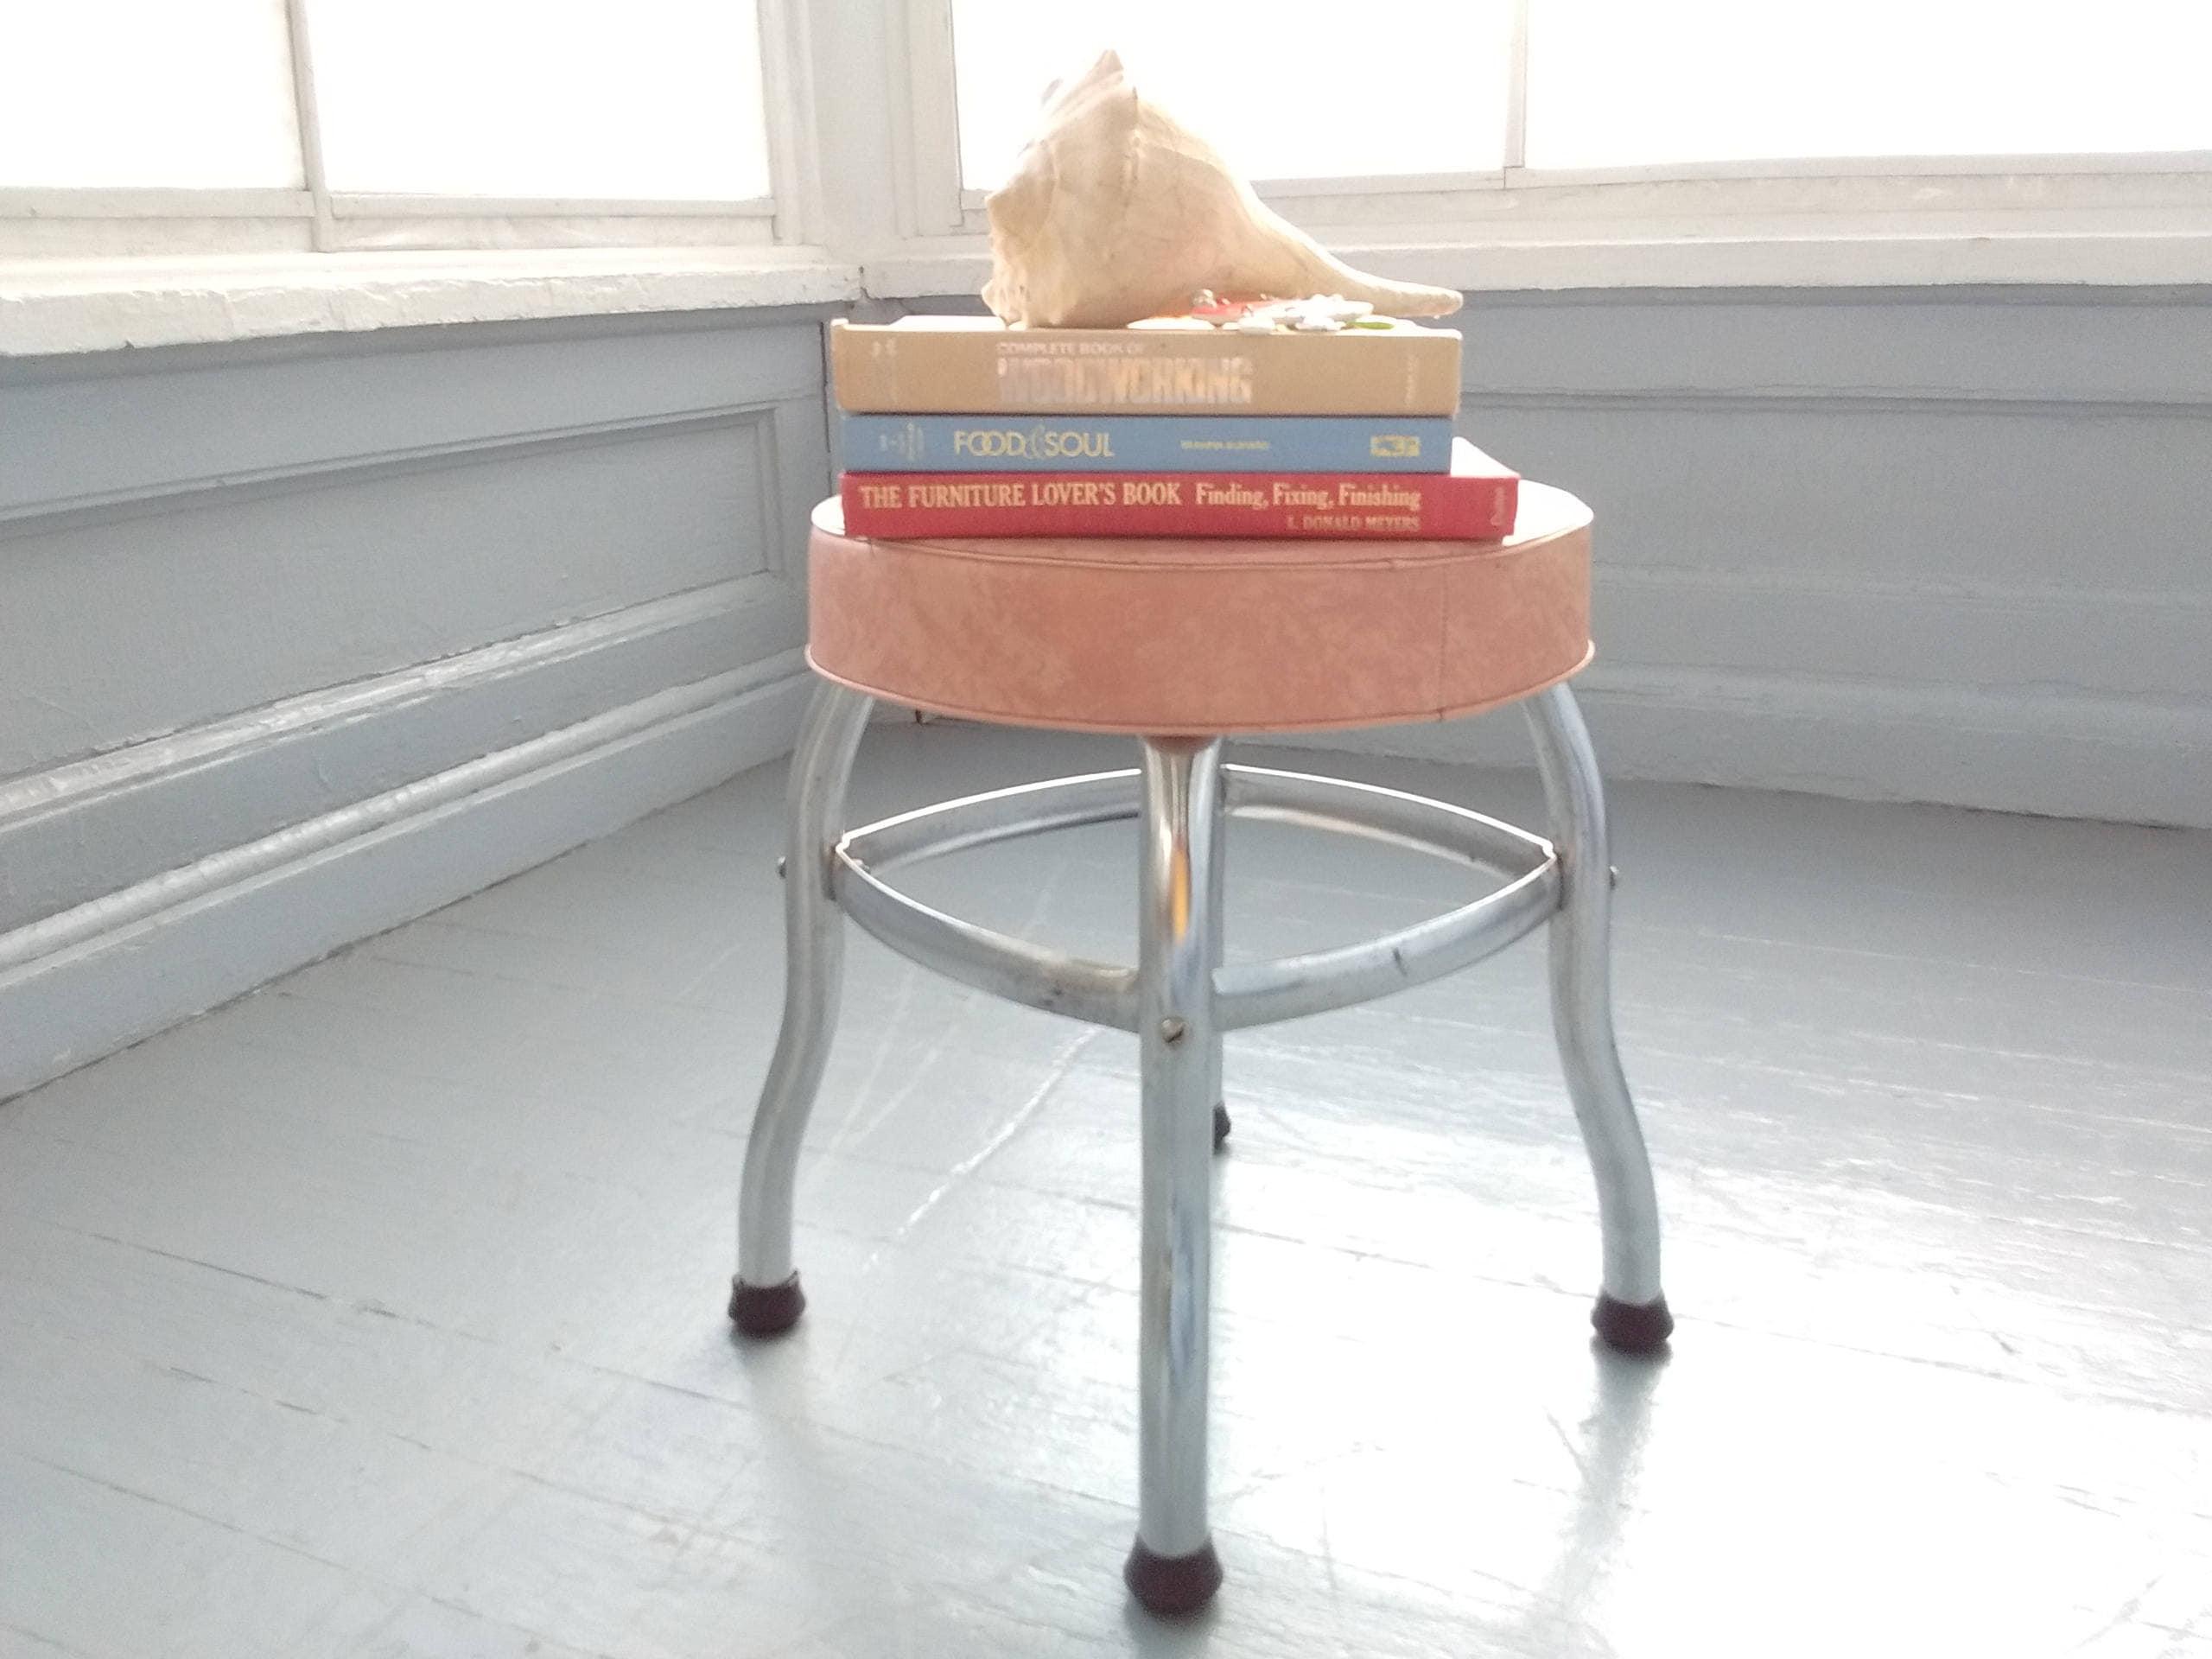 Amazing Vintage Stool Foot Stool Round Metal Stool Upholstered Inzonedesignstudio Interior Chair Design Inzonedesignstudiocom